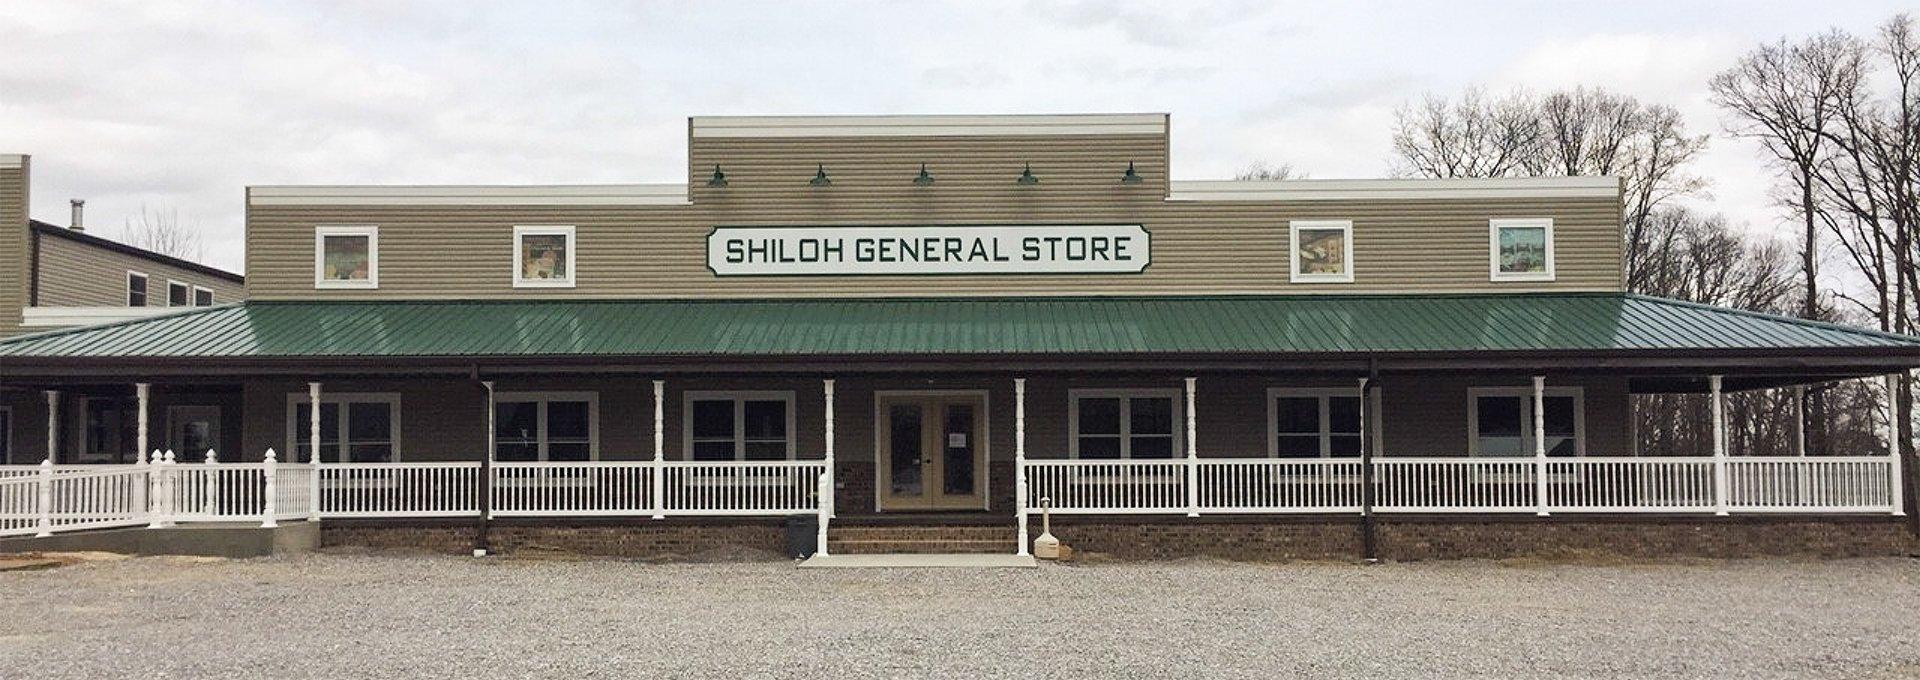 Shiloh General Store Boone Winston Salem Nc